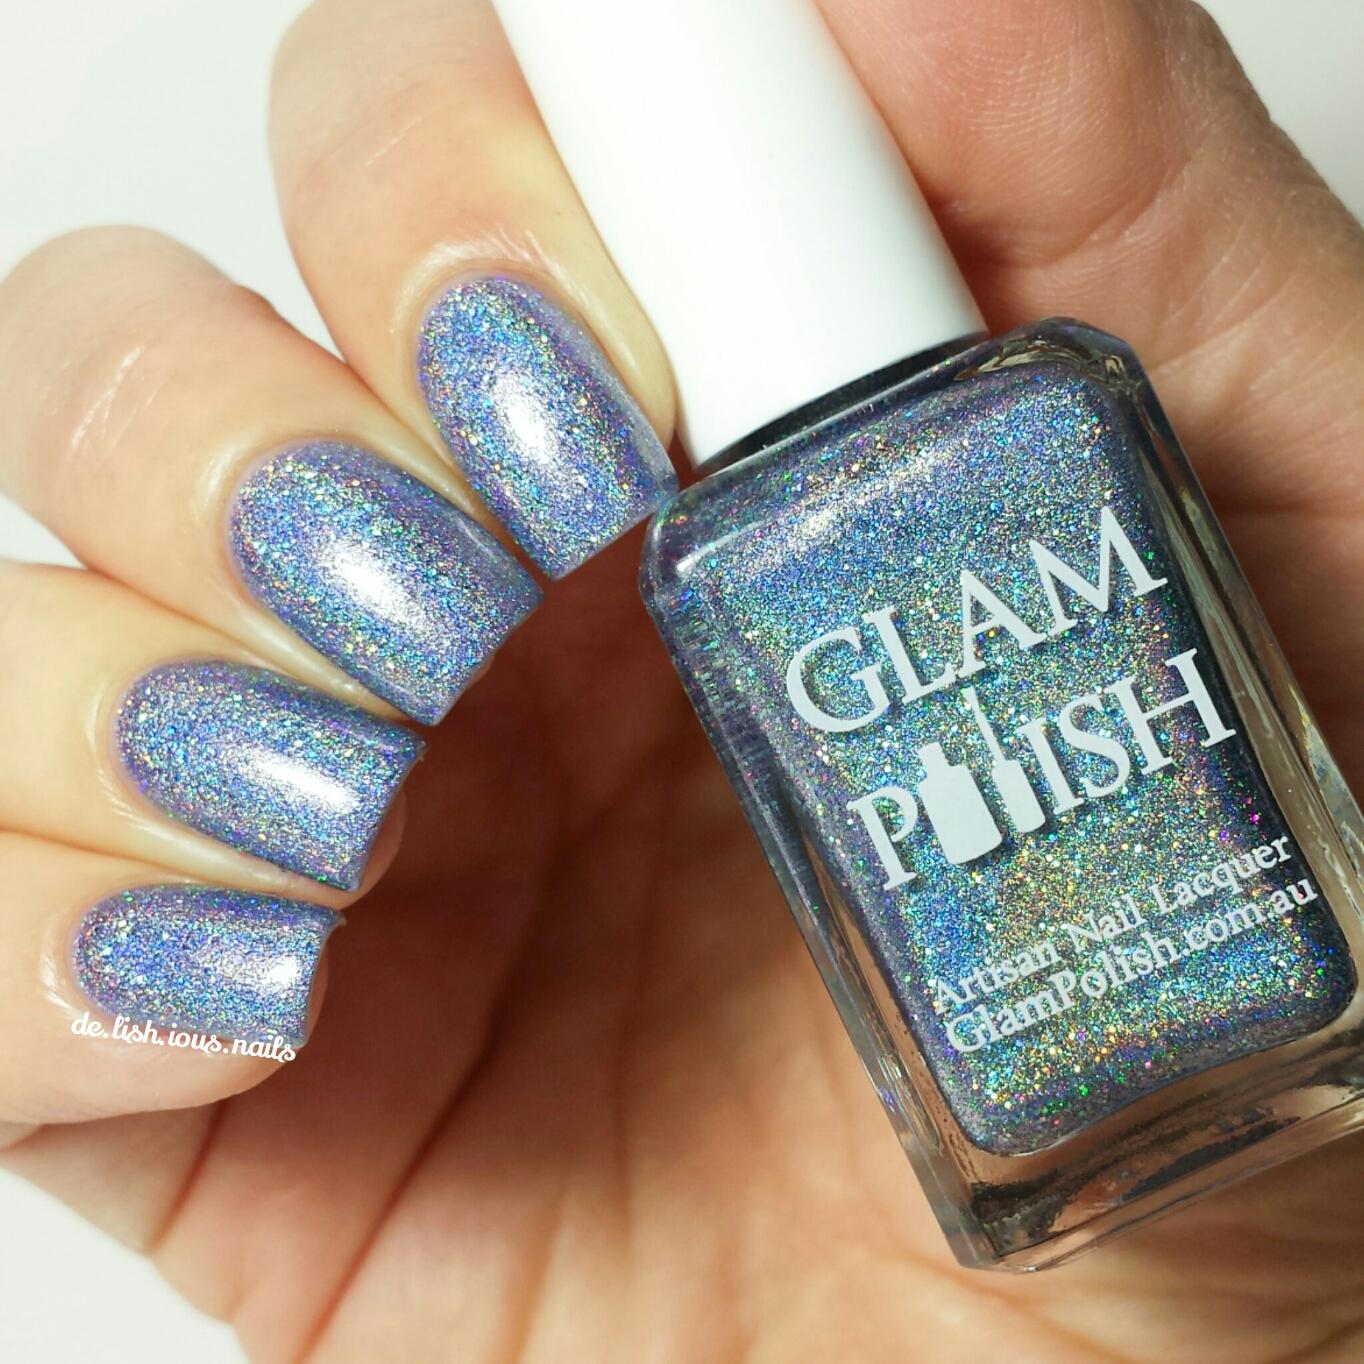 glam-polish-big-girls-need-big-diamonds-1.jpg.jpeg